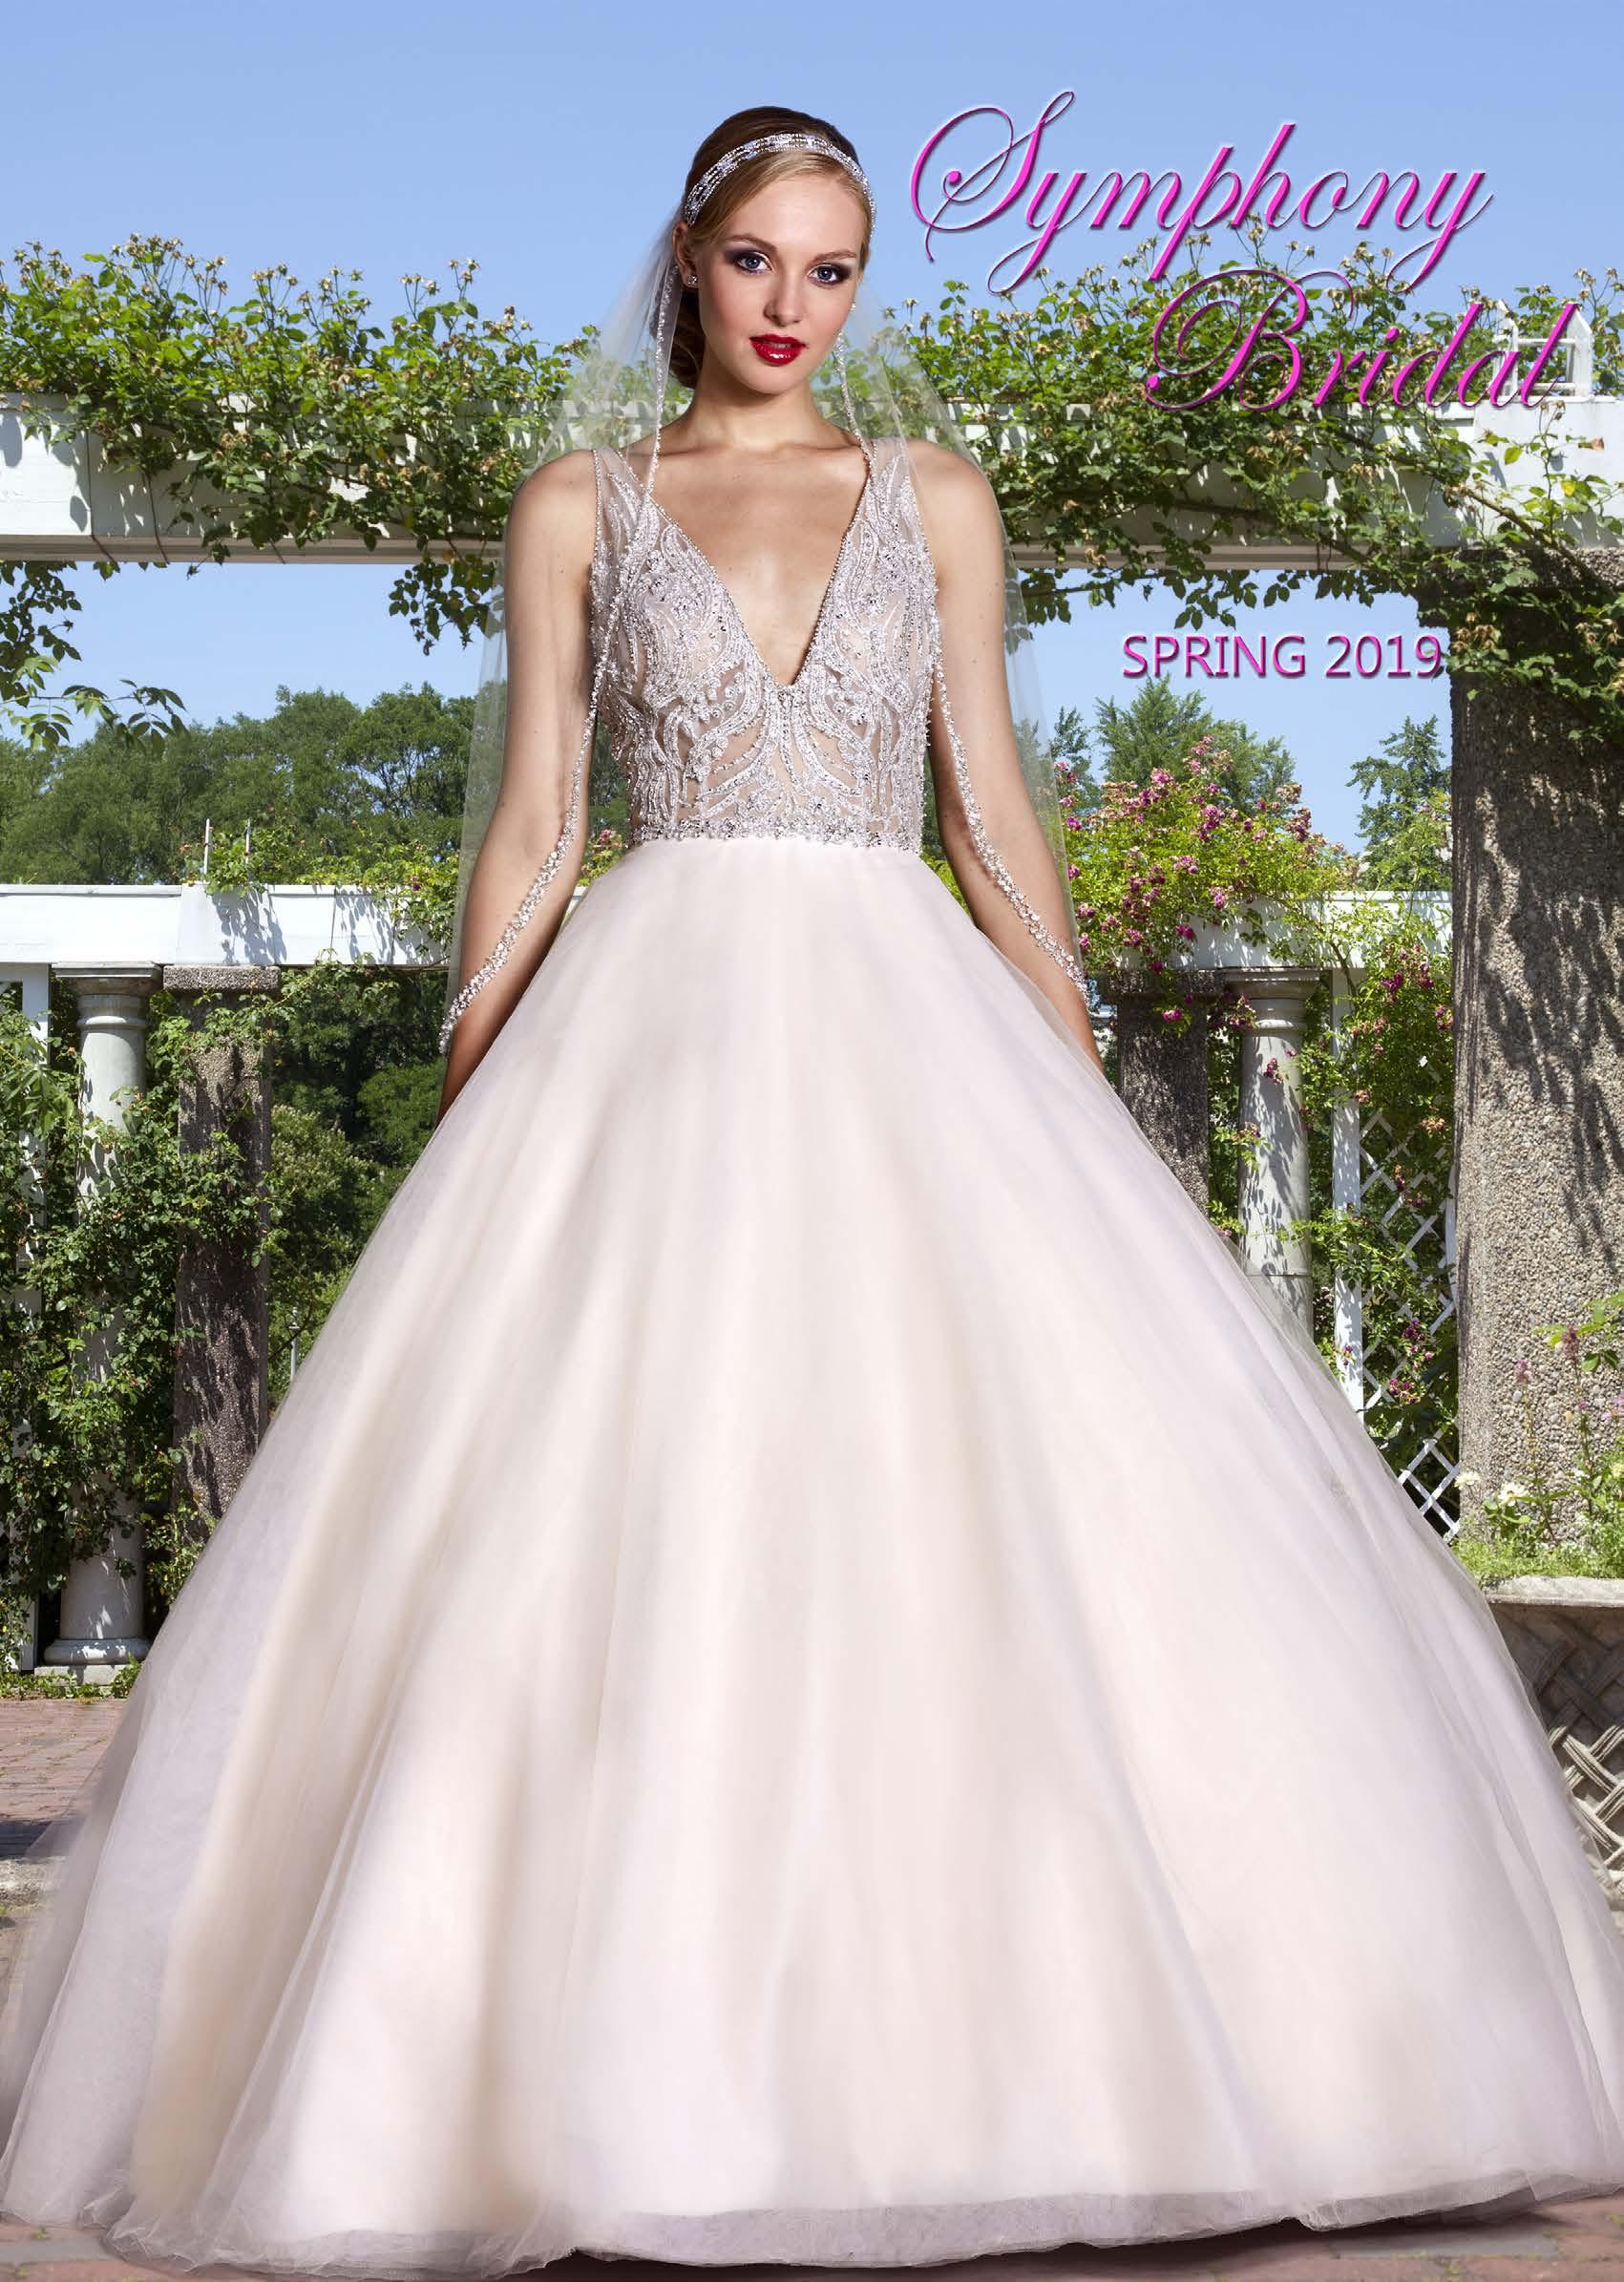 Symphony Bridal Spring 2019 Catalog